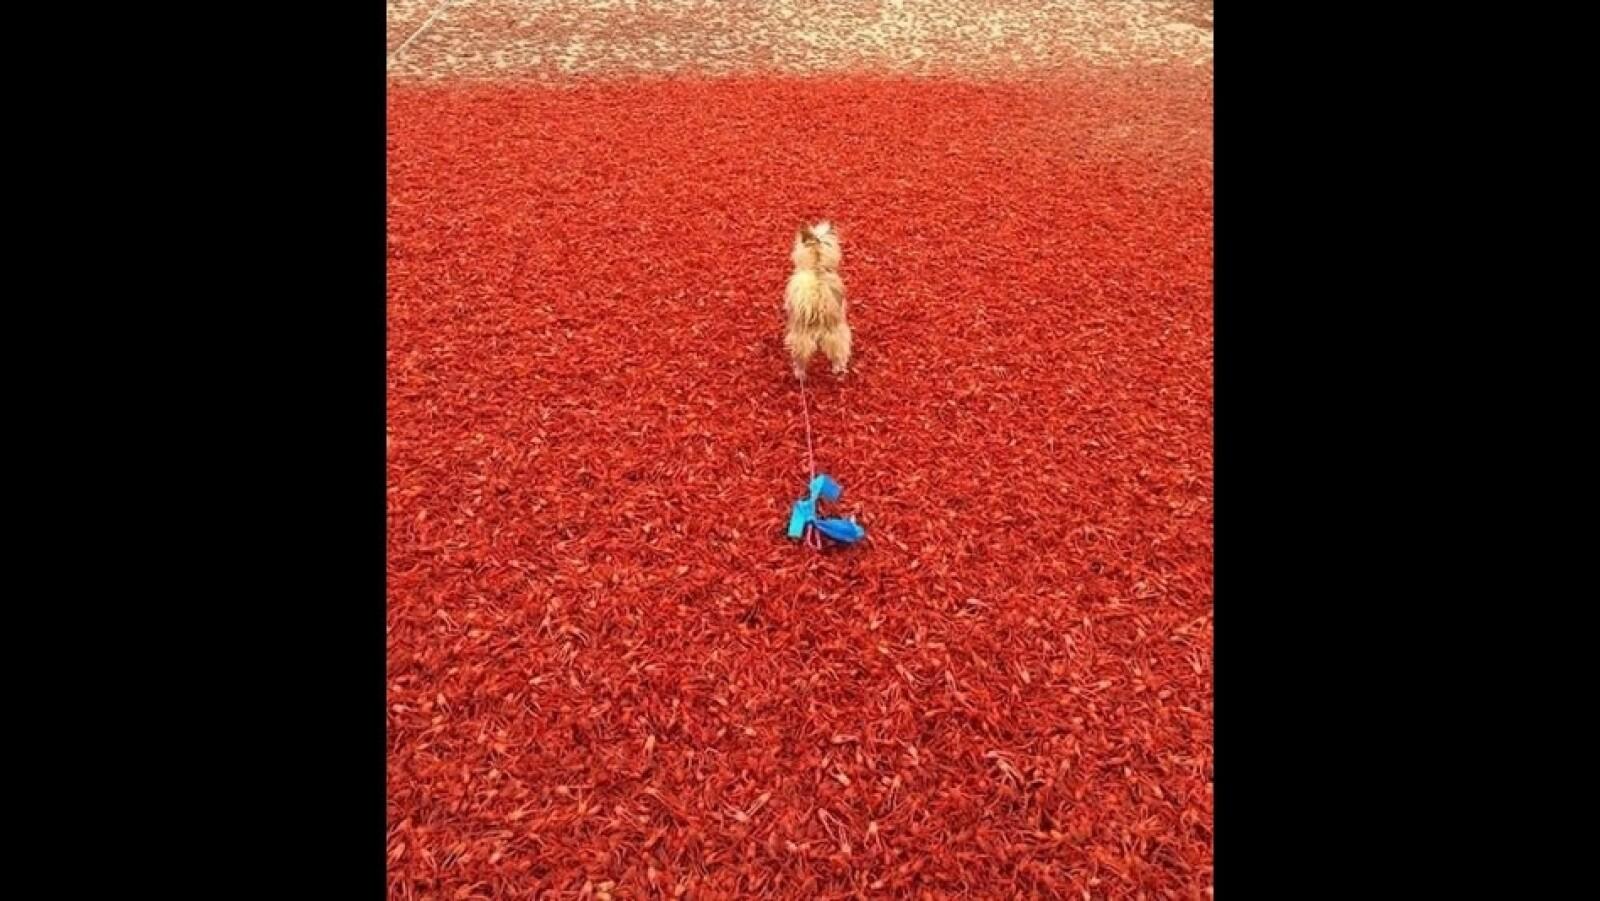 Cangrejos rojos playa California perro